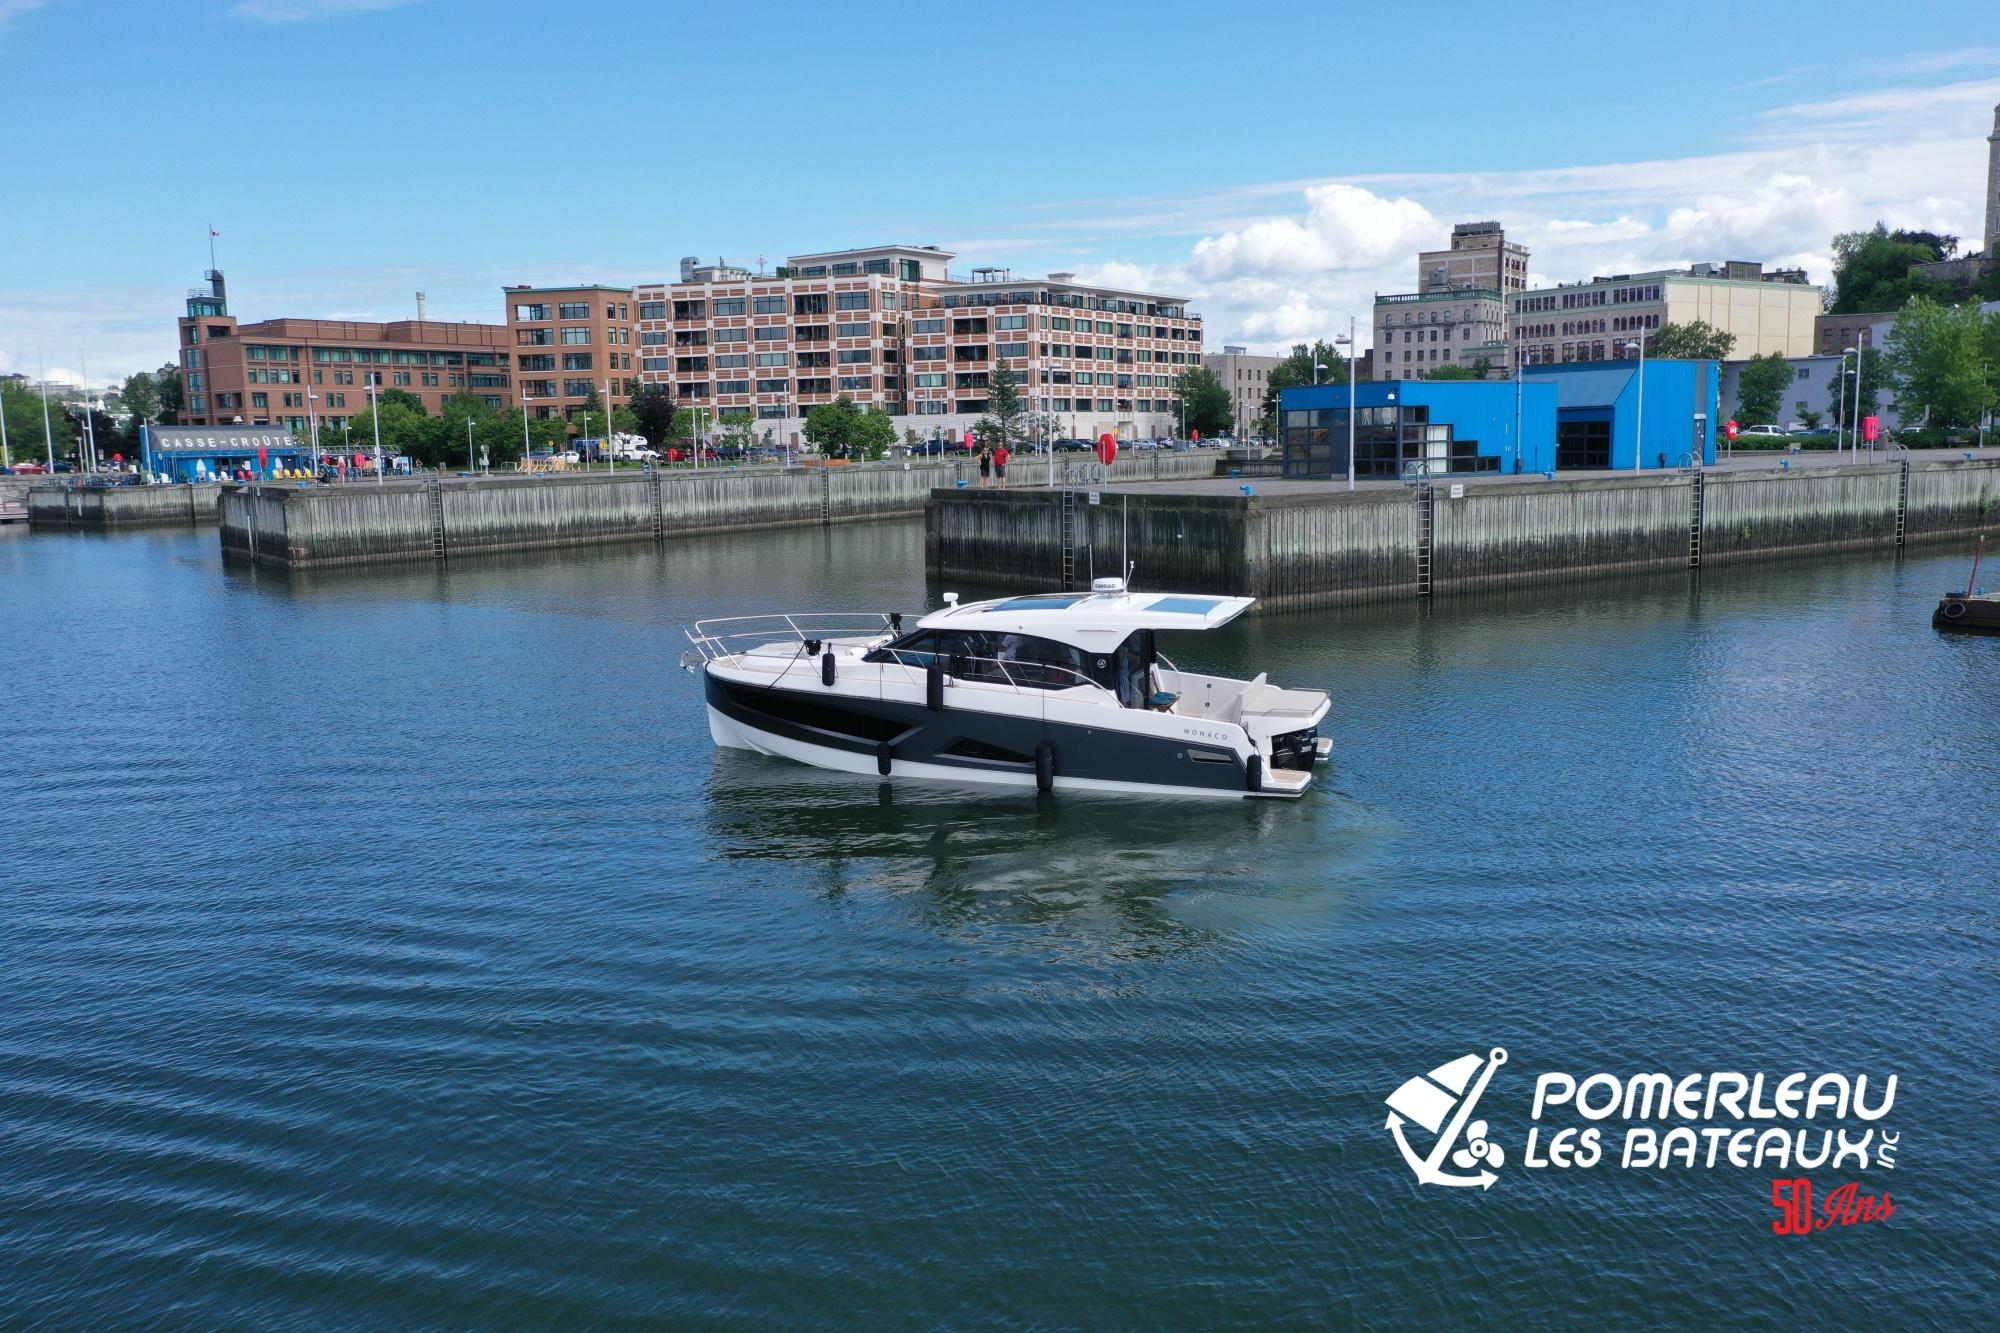 Parker Boats Monaco DEMO - A0AE18880C4947213F4EEA094EE15B7B.jpeg